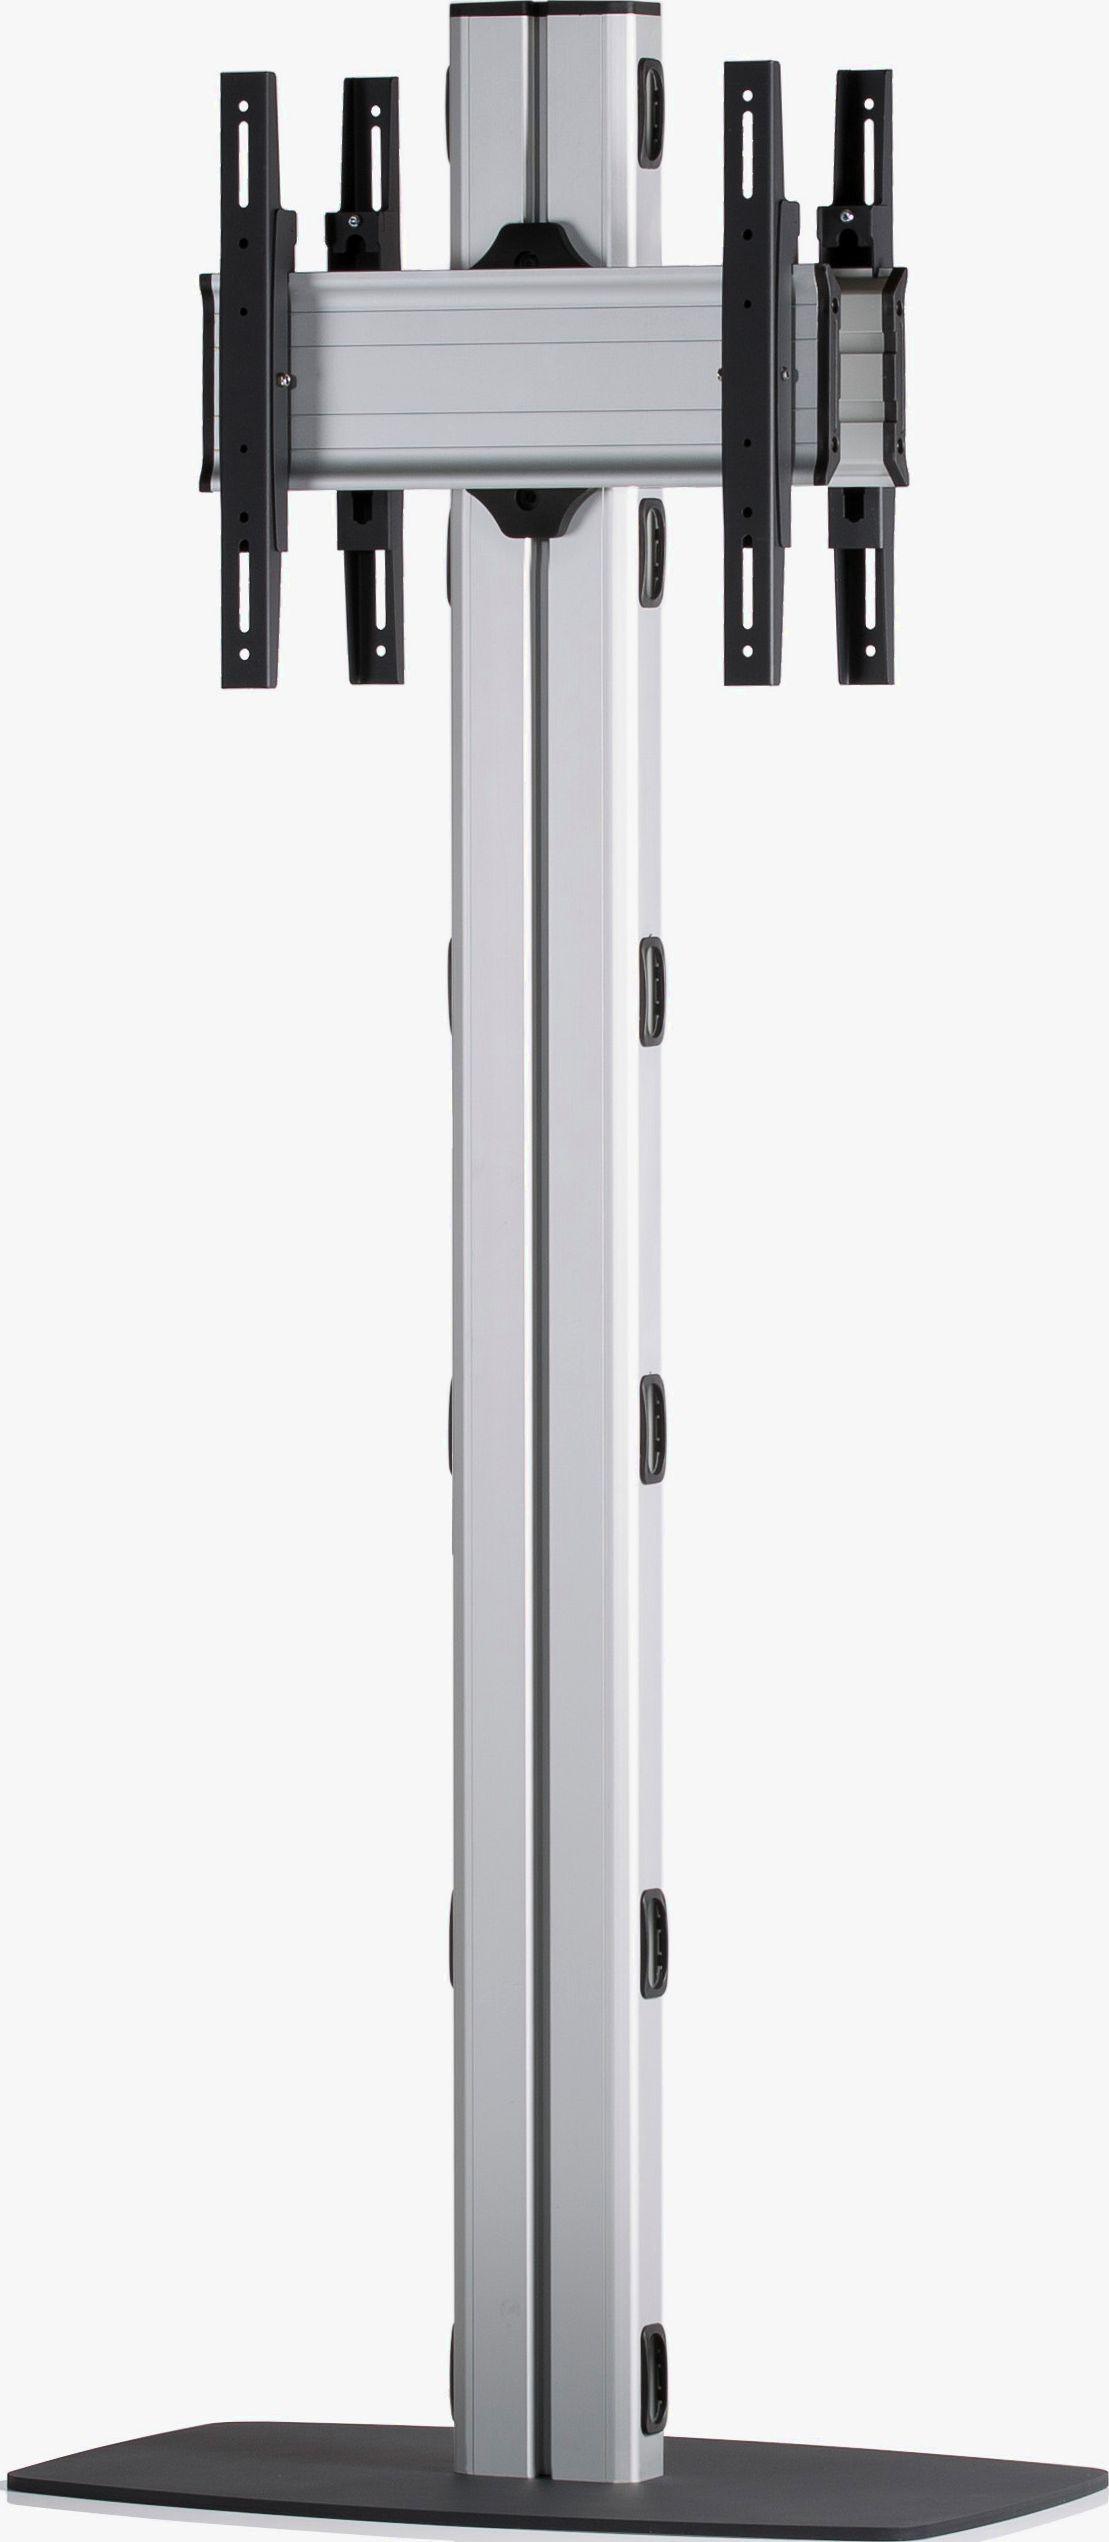 2 Displays 1x1 beidseitig, Höhe 180 cm, Standard-VESA, mit Standfuß